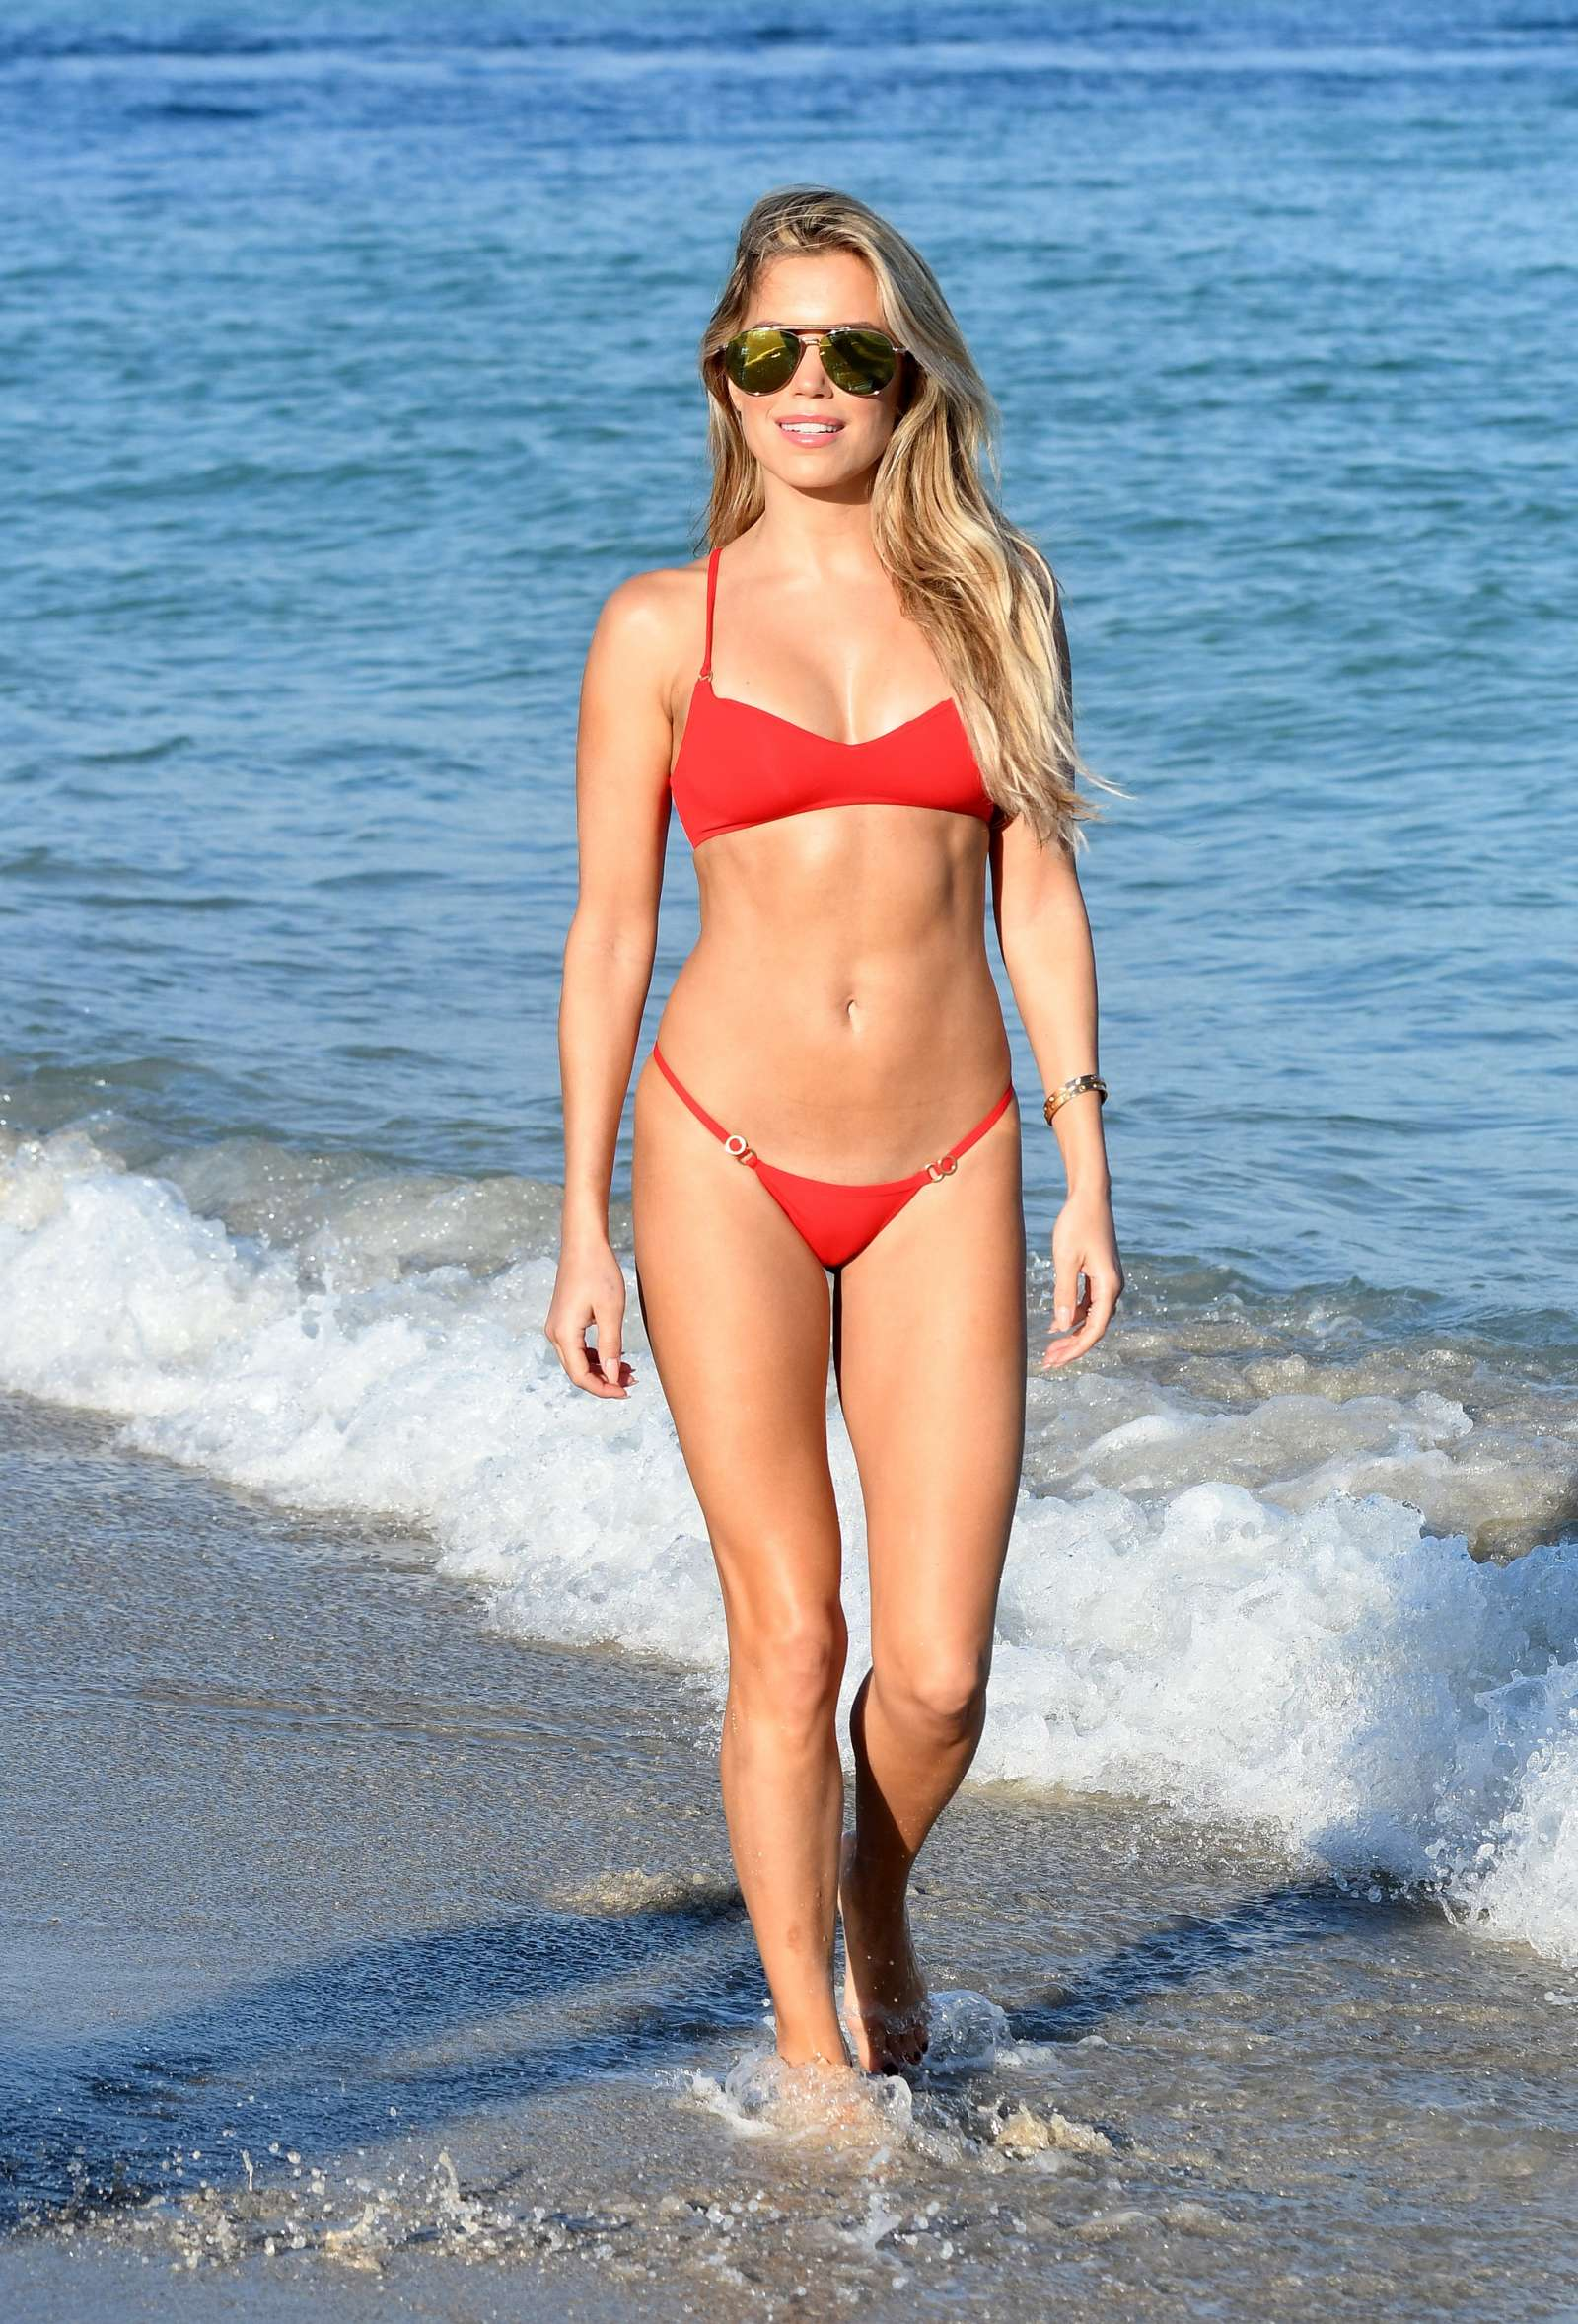 Sylvie Meis In Red Bikini On The Beach In Miami Indian